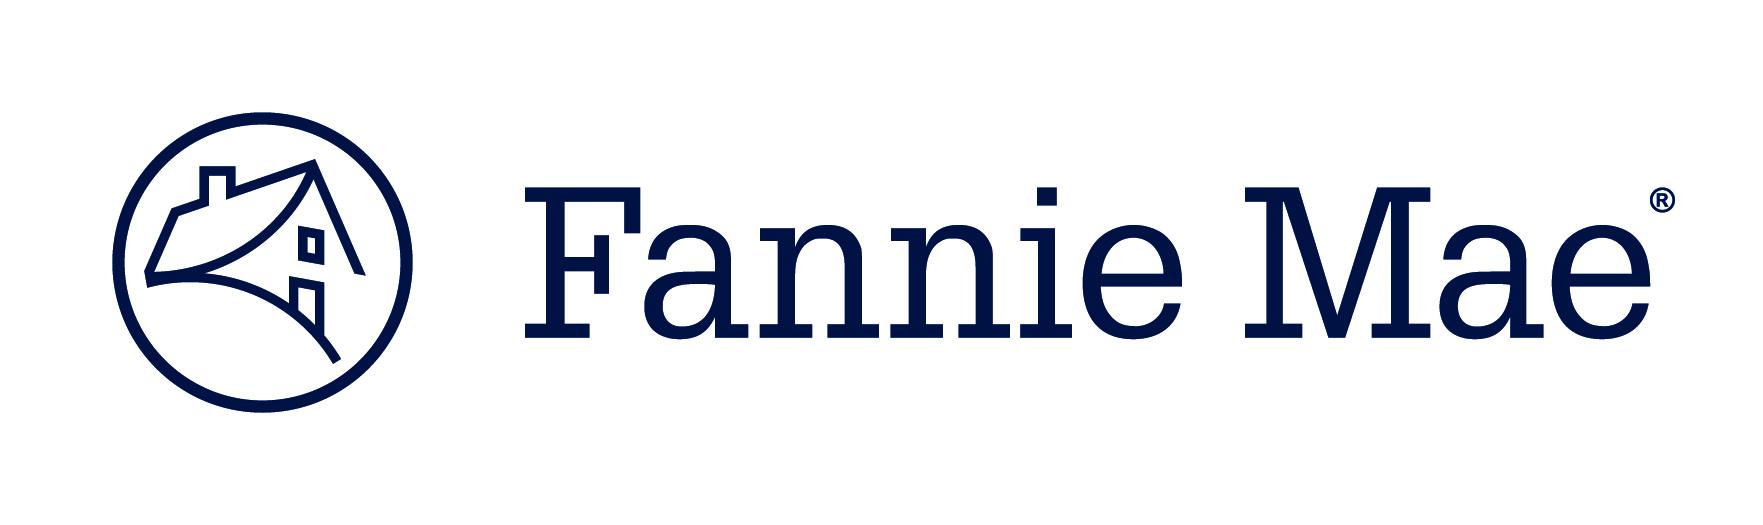 fema declaration format